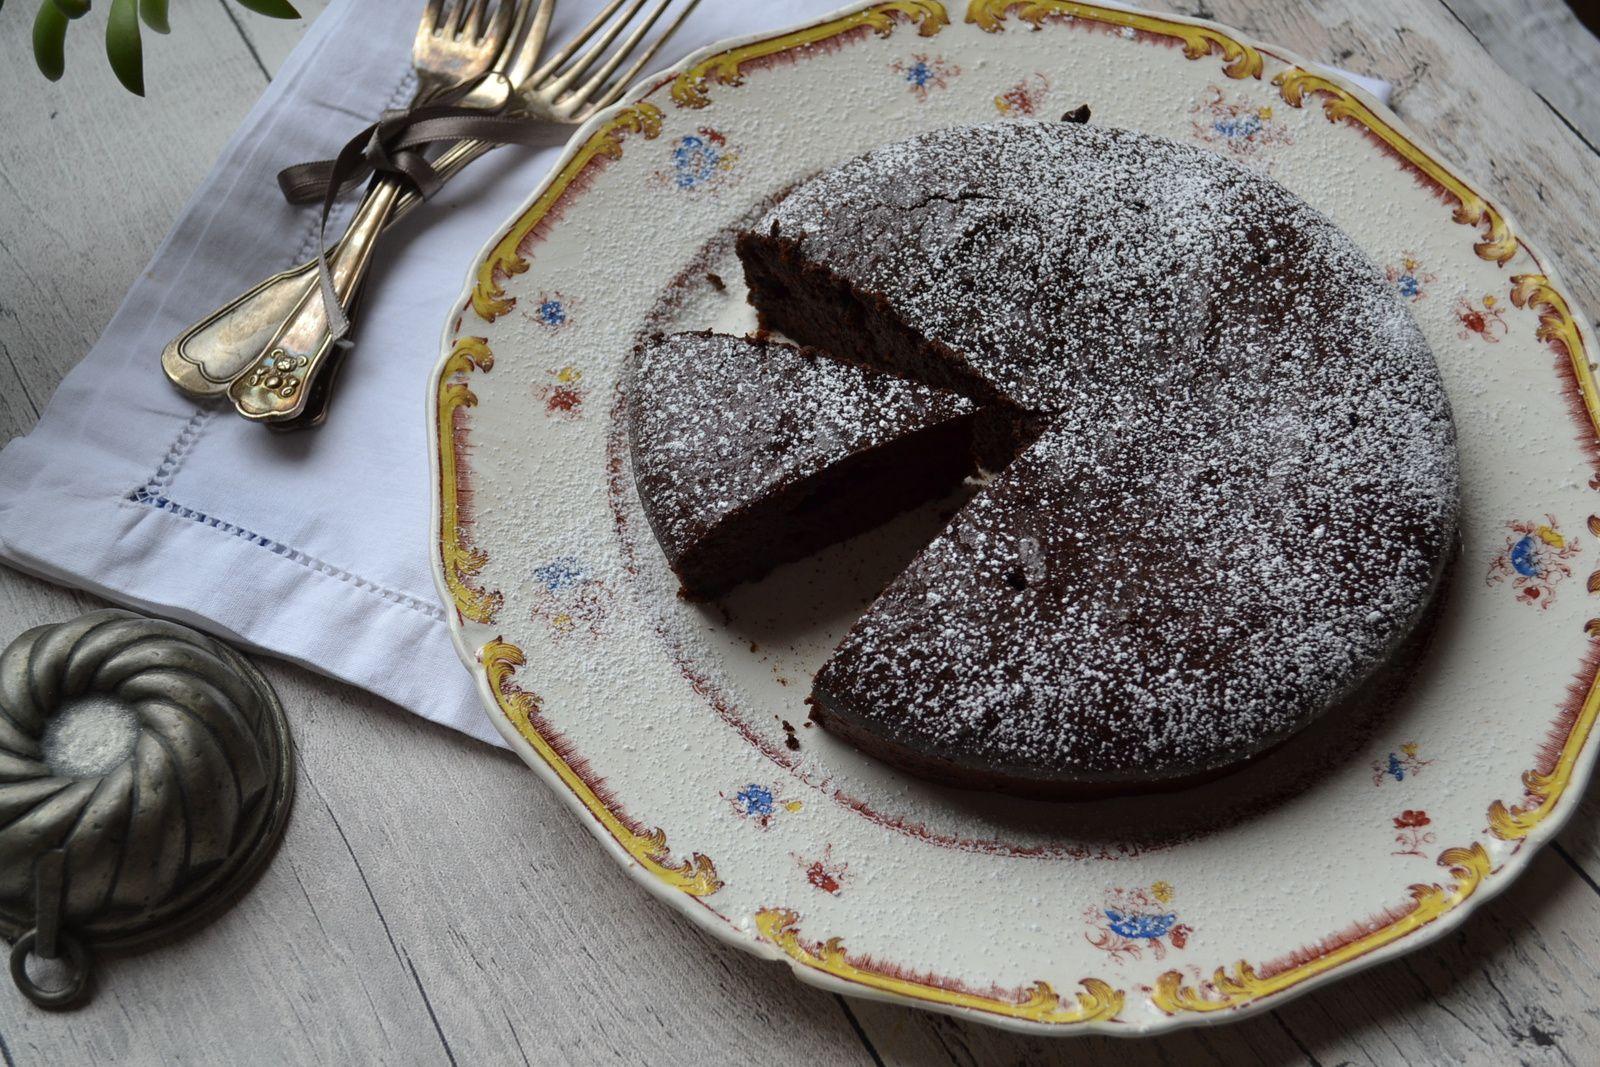 Torta cioccolato e mandorle #Jours Heureux